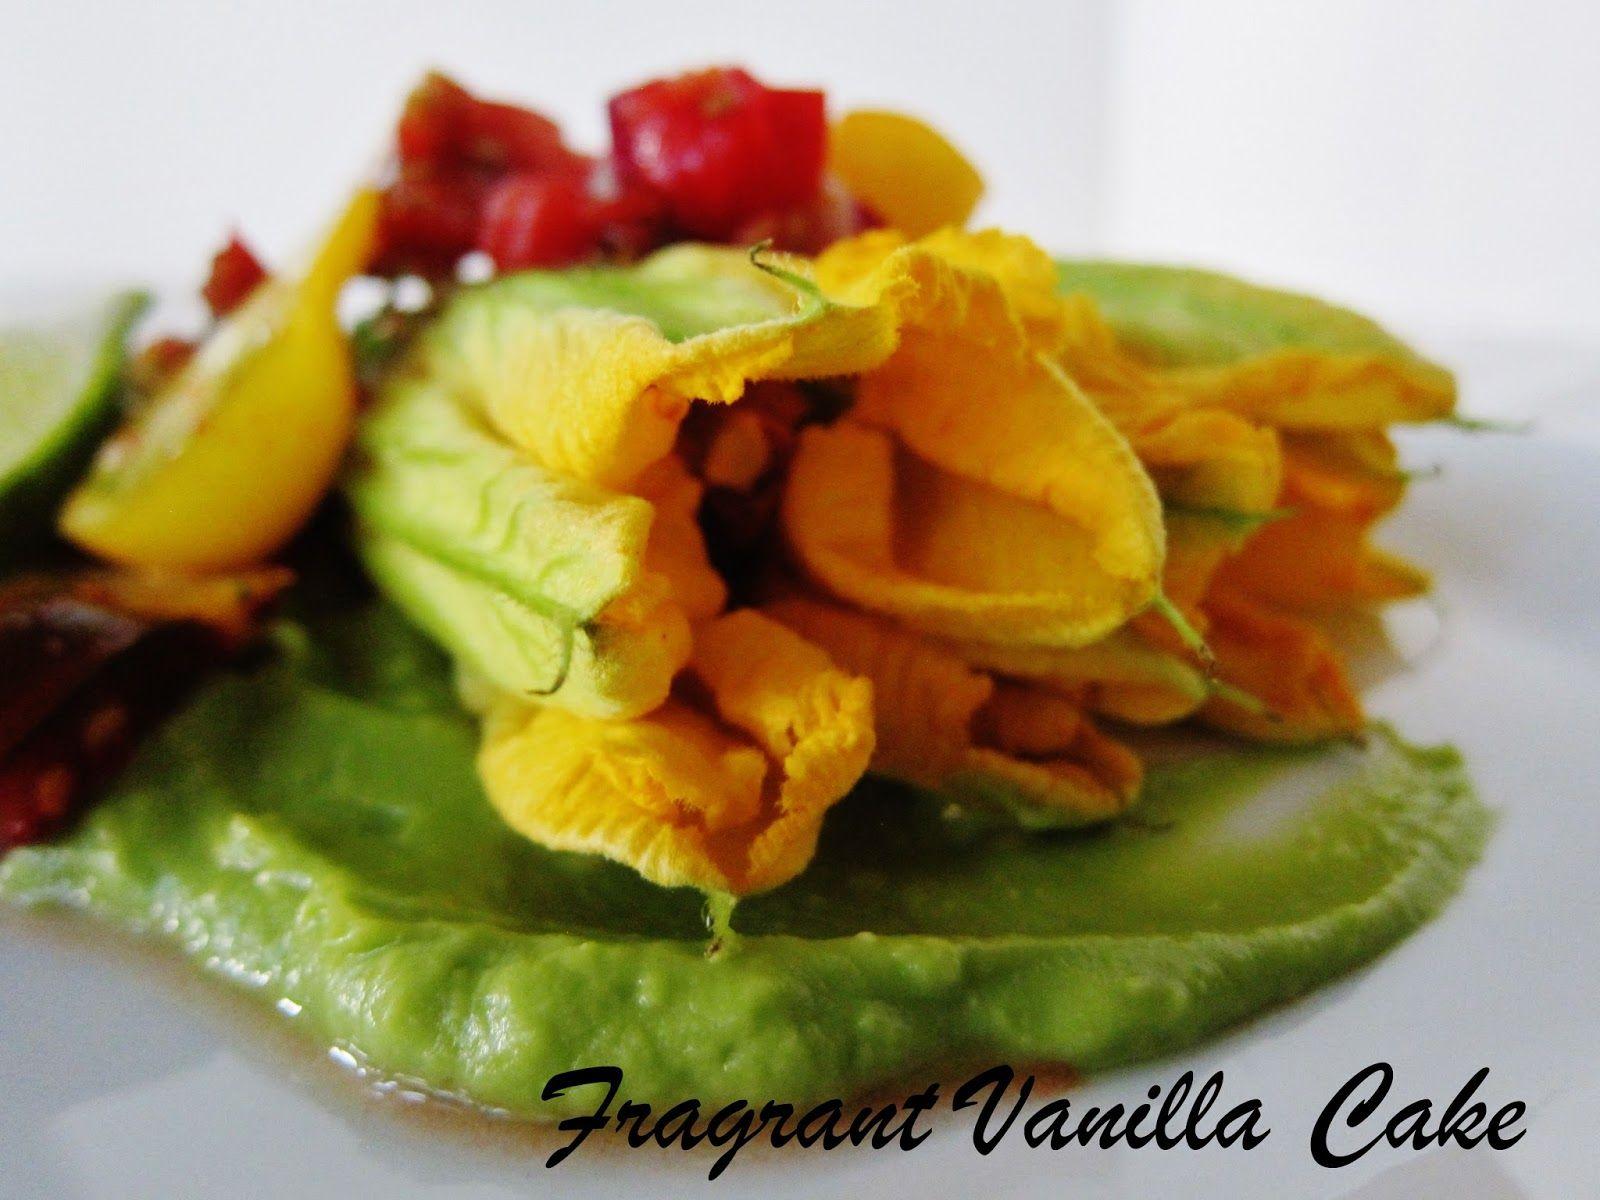 Fragrant Vanilla Cake: Raw Mexican Stuffed Squash Blossoms